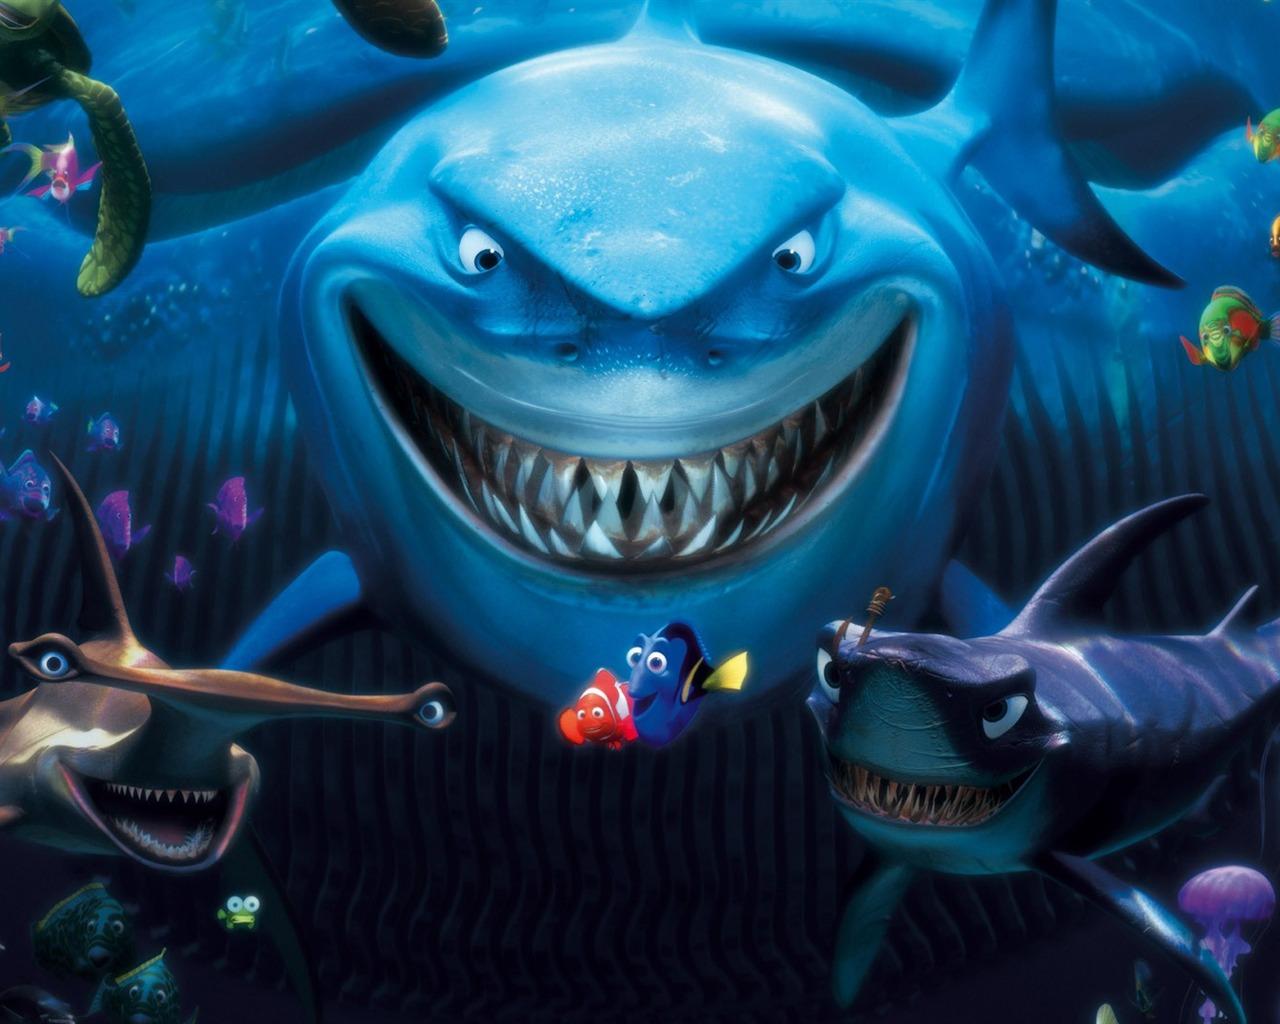 Finding Nemo 3D Movie HD Desktop Wallpaper 03-1280x1024 ...